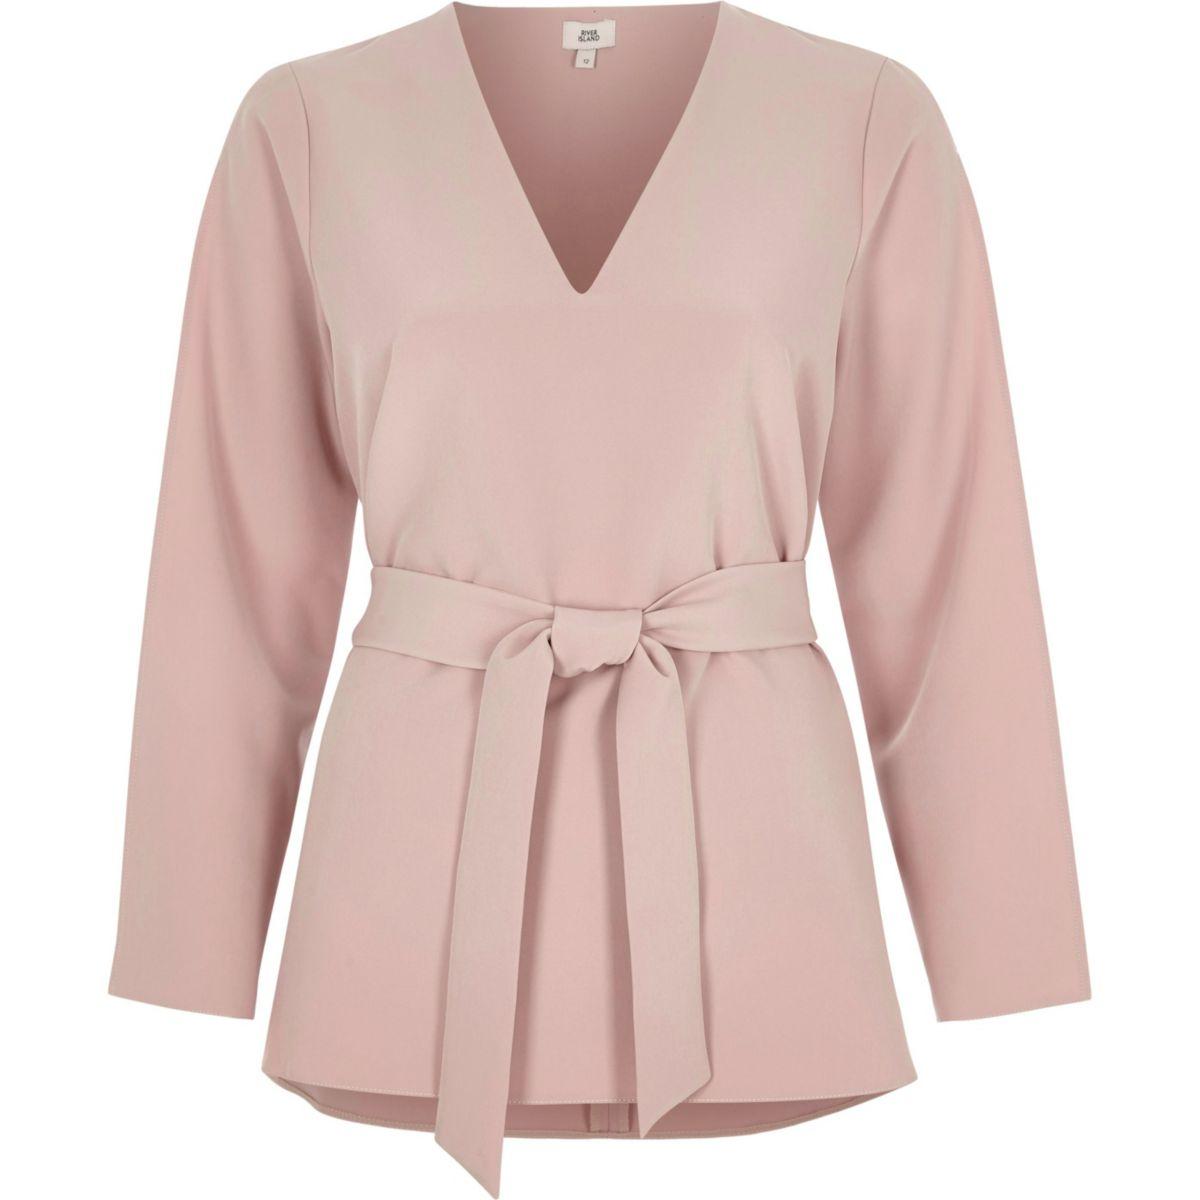 Light pink long split sleeve tie waist top